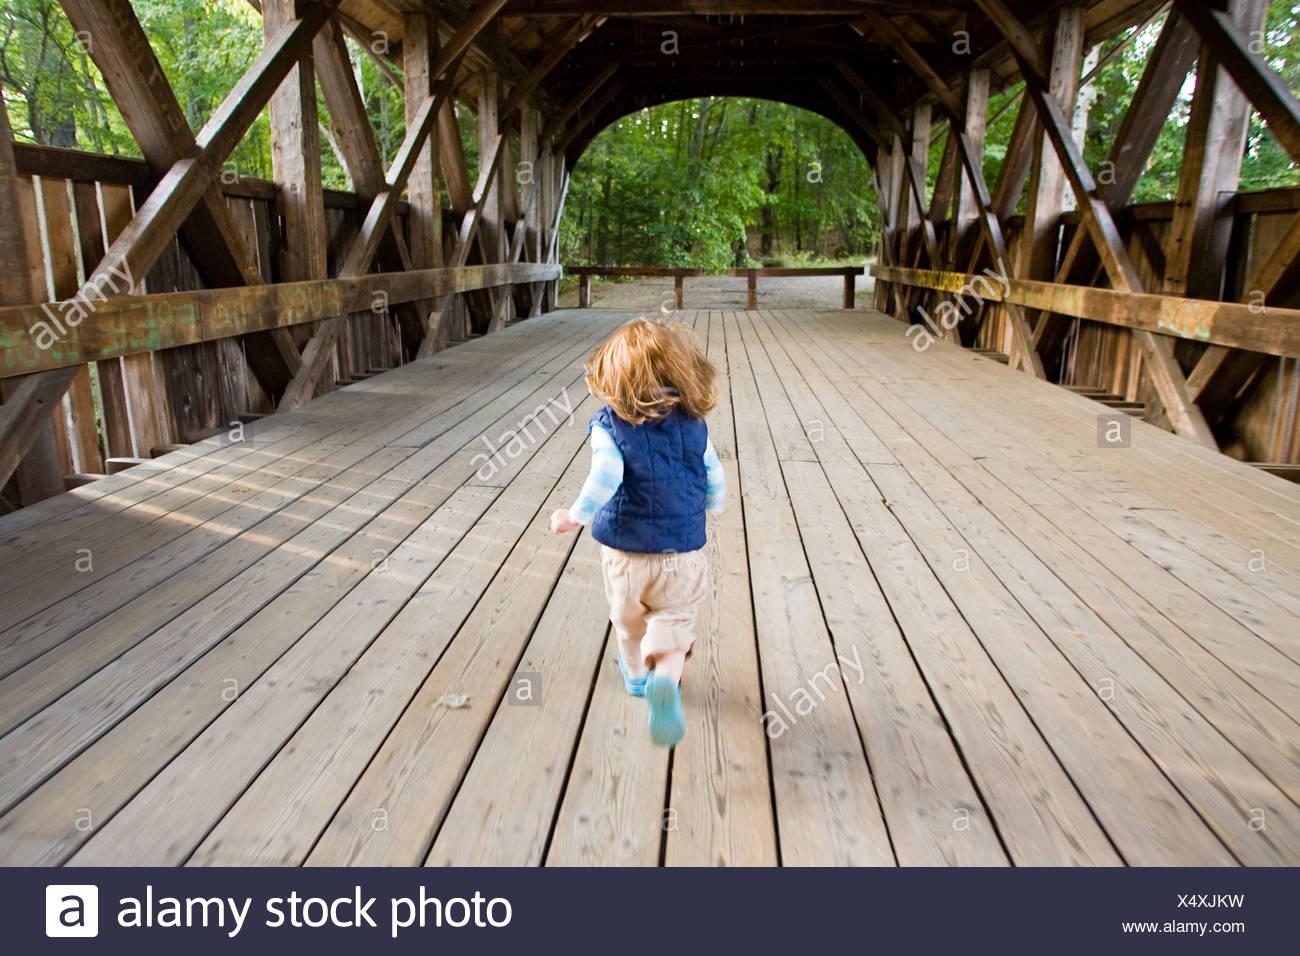 A little girl runs across a covered bridge. - Stock Image